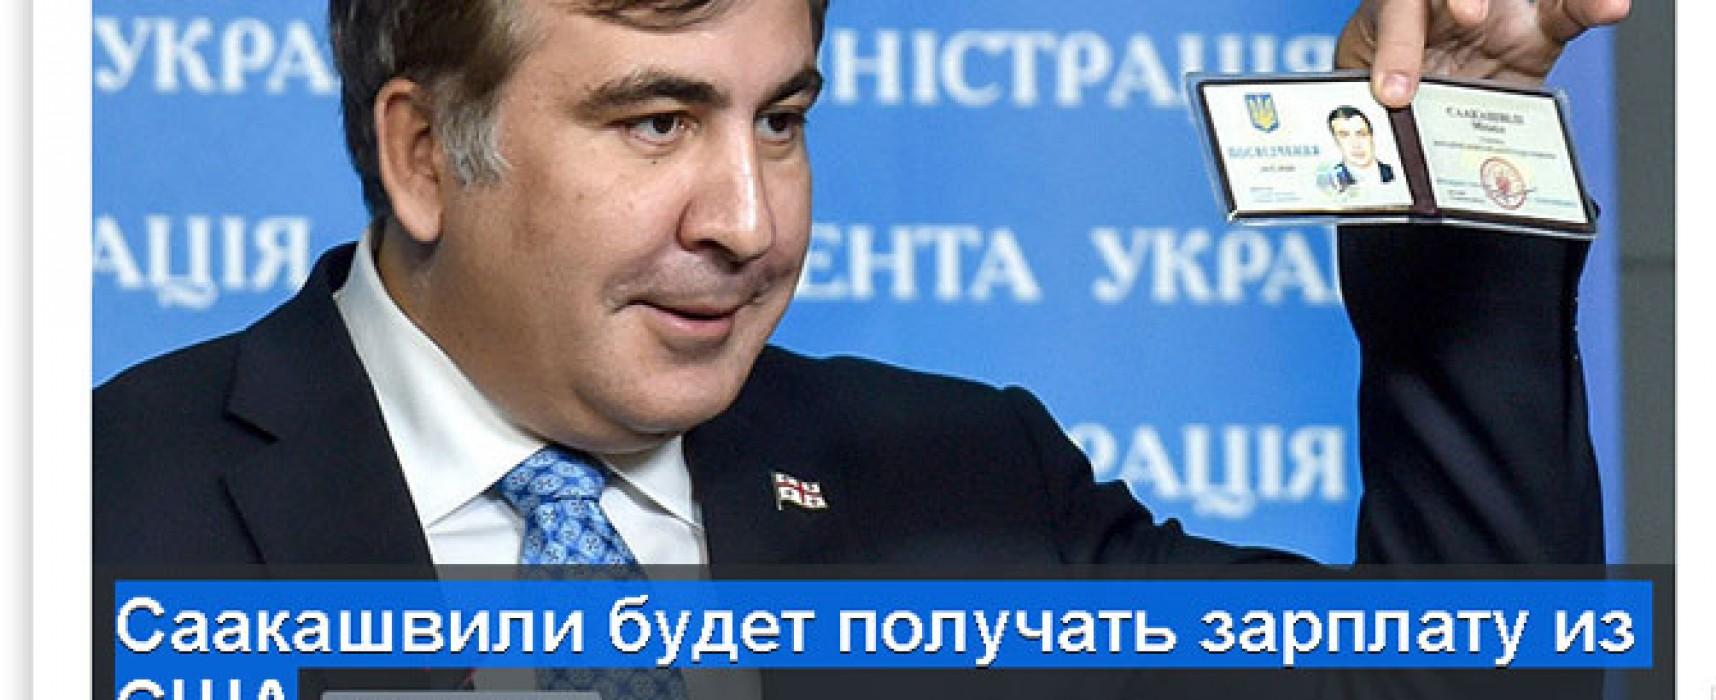 Фейк: США будут платить зарплату Саакашвили